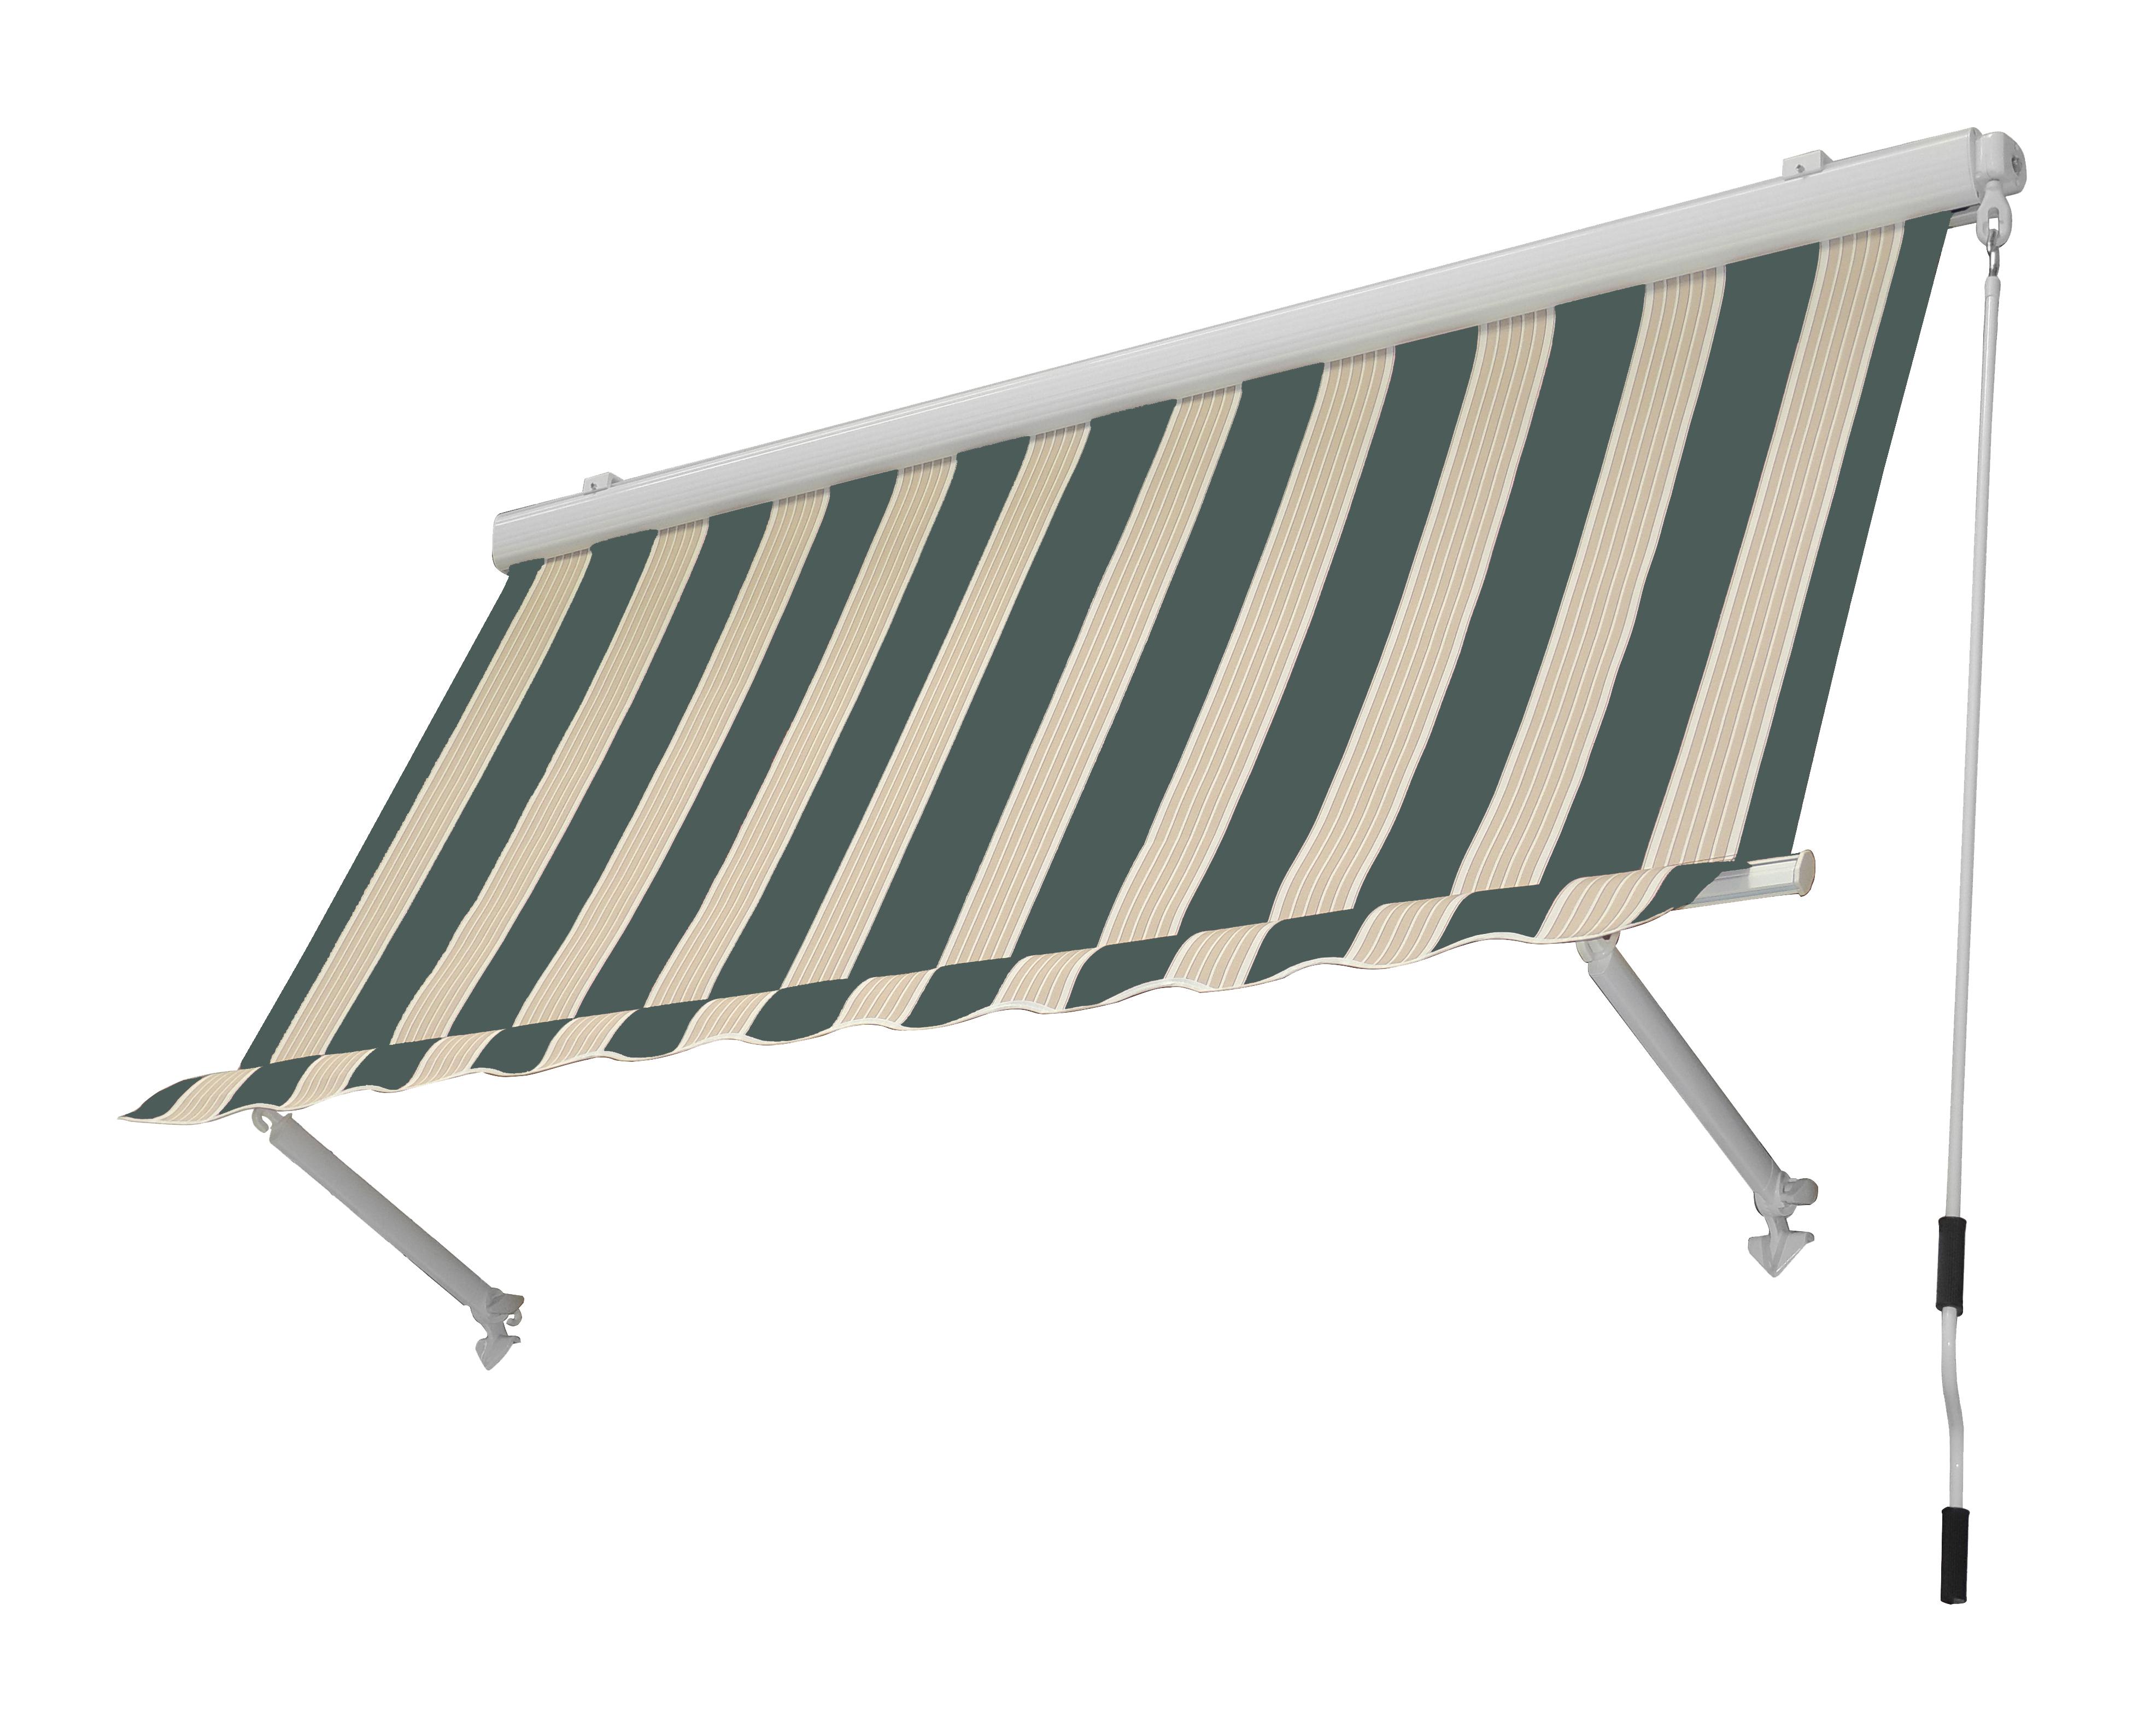 Tenda Da Sole 300x250cm Cassonata Beige Verde Bricocasa